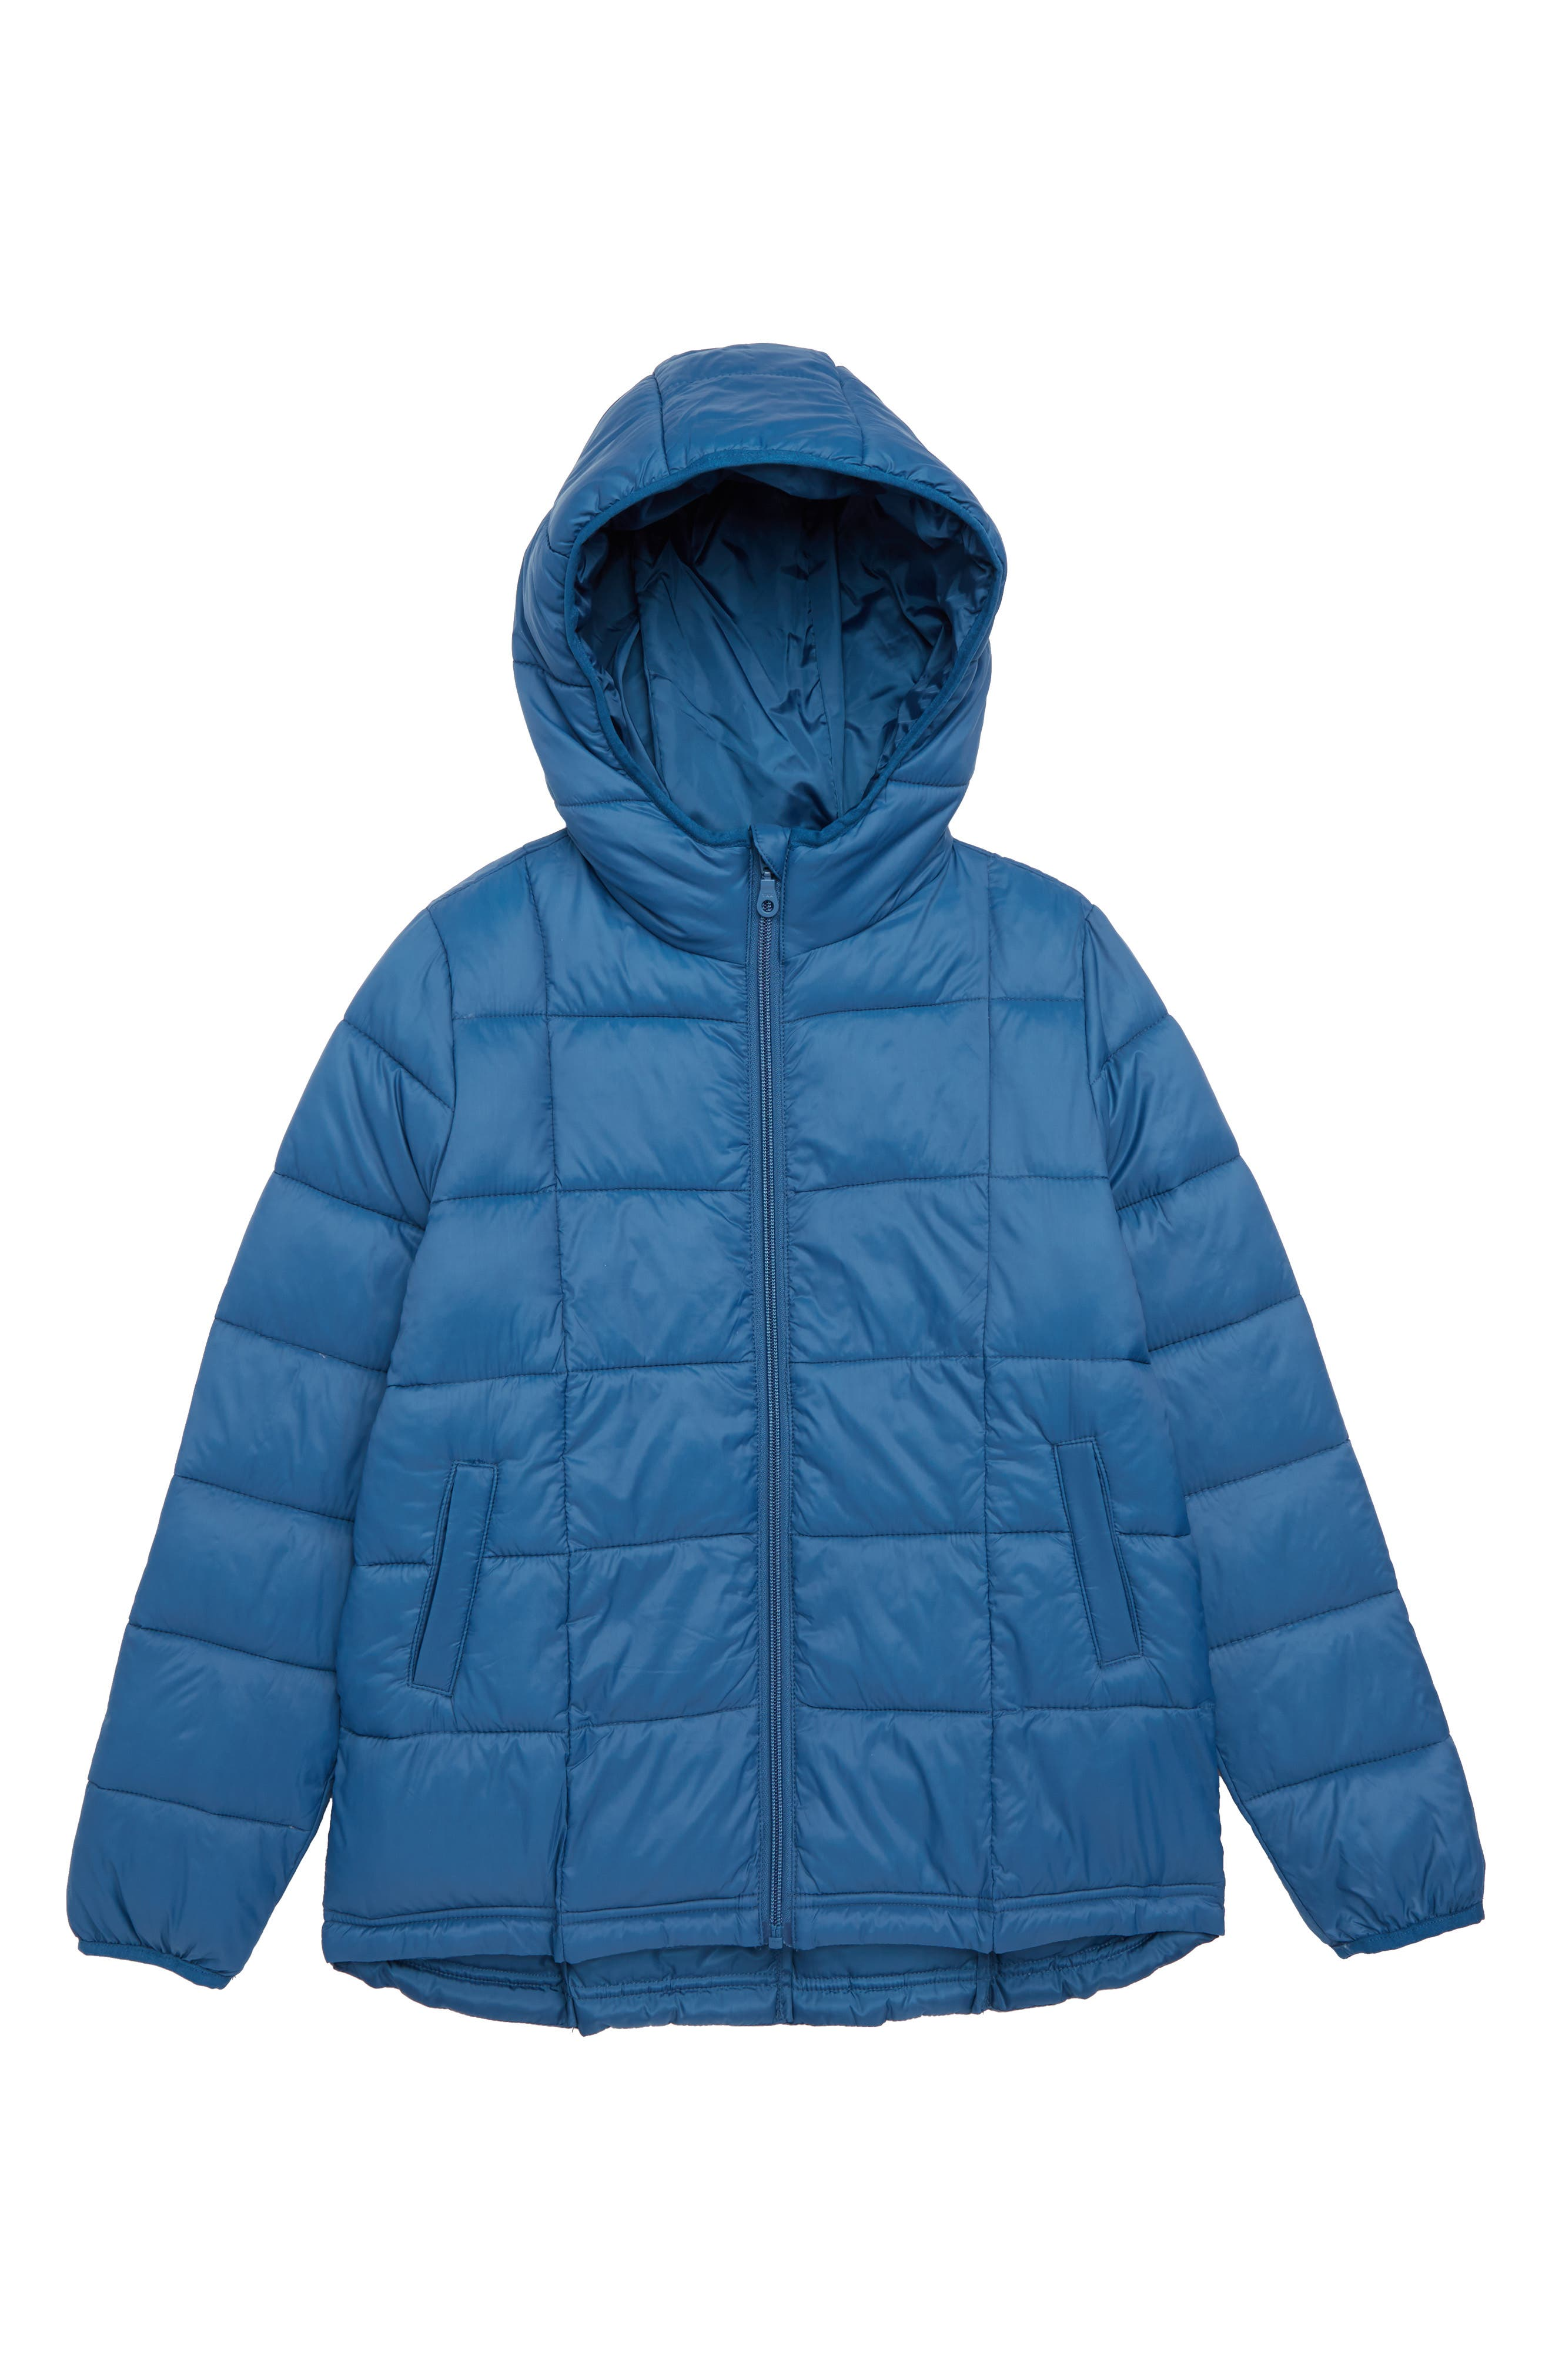 Boys Tucker  Tate Packable Puffer Jacket Size XXL (1820)  Blue